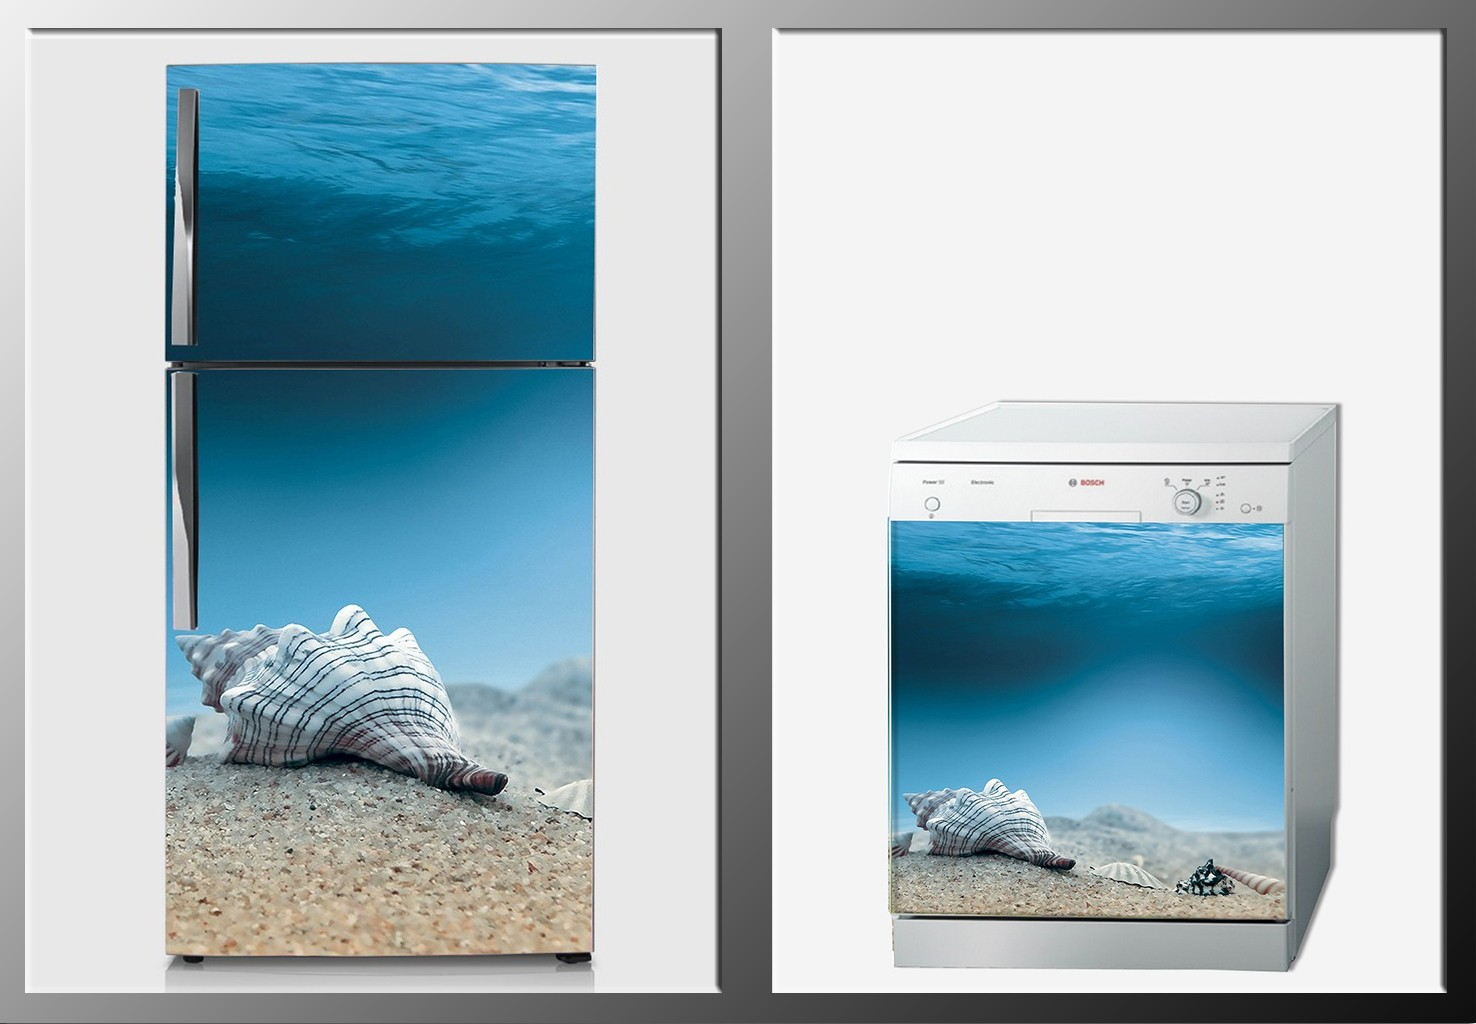 ArtWall Beyaz Eşya Deniz Sticker